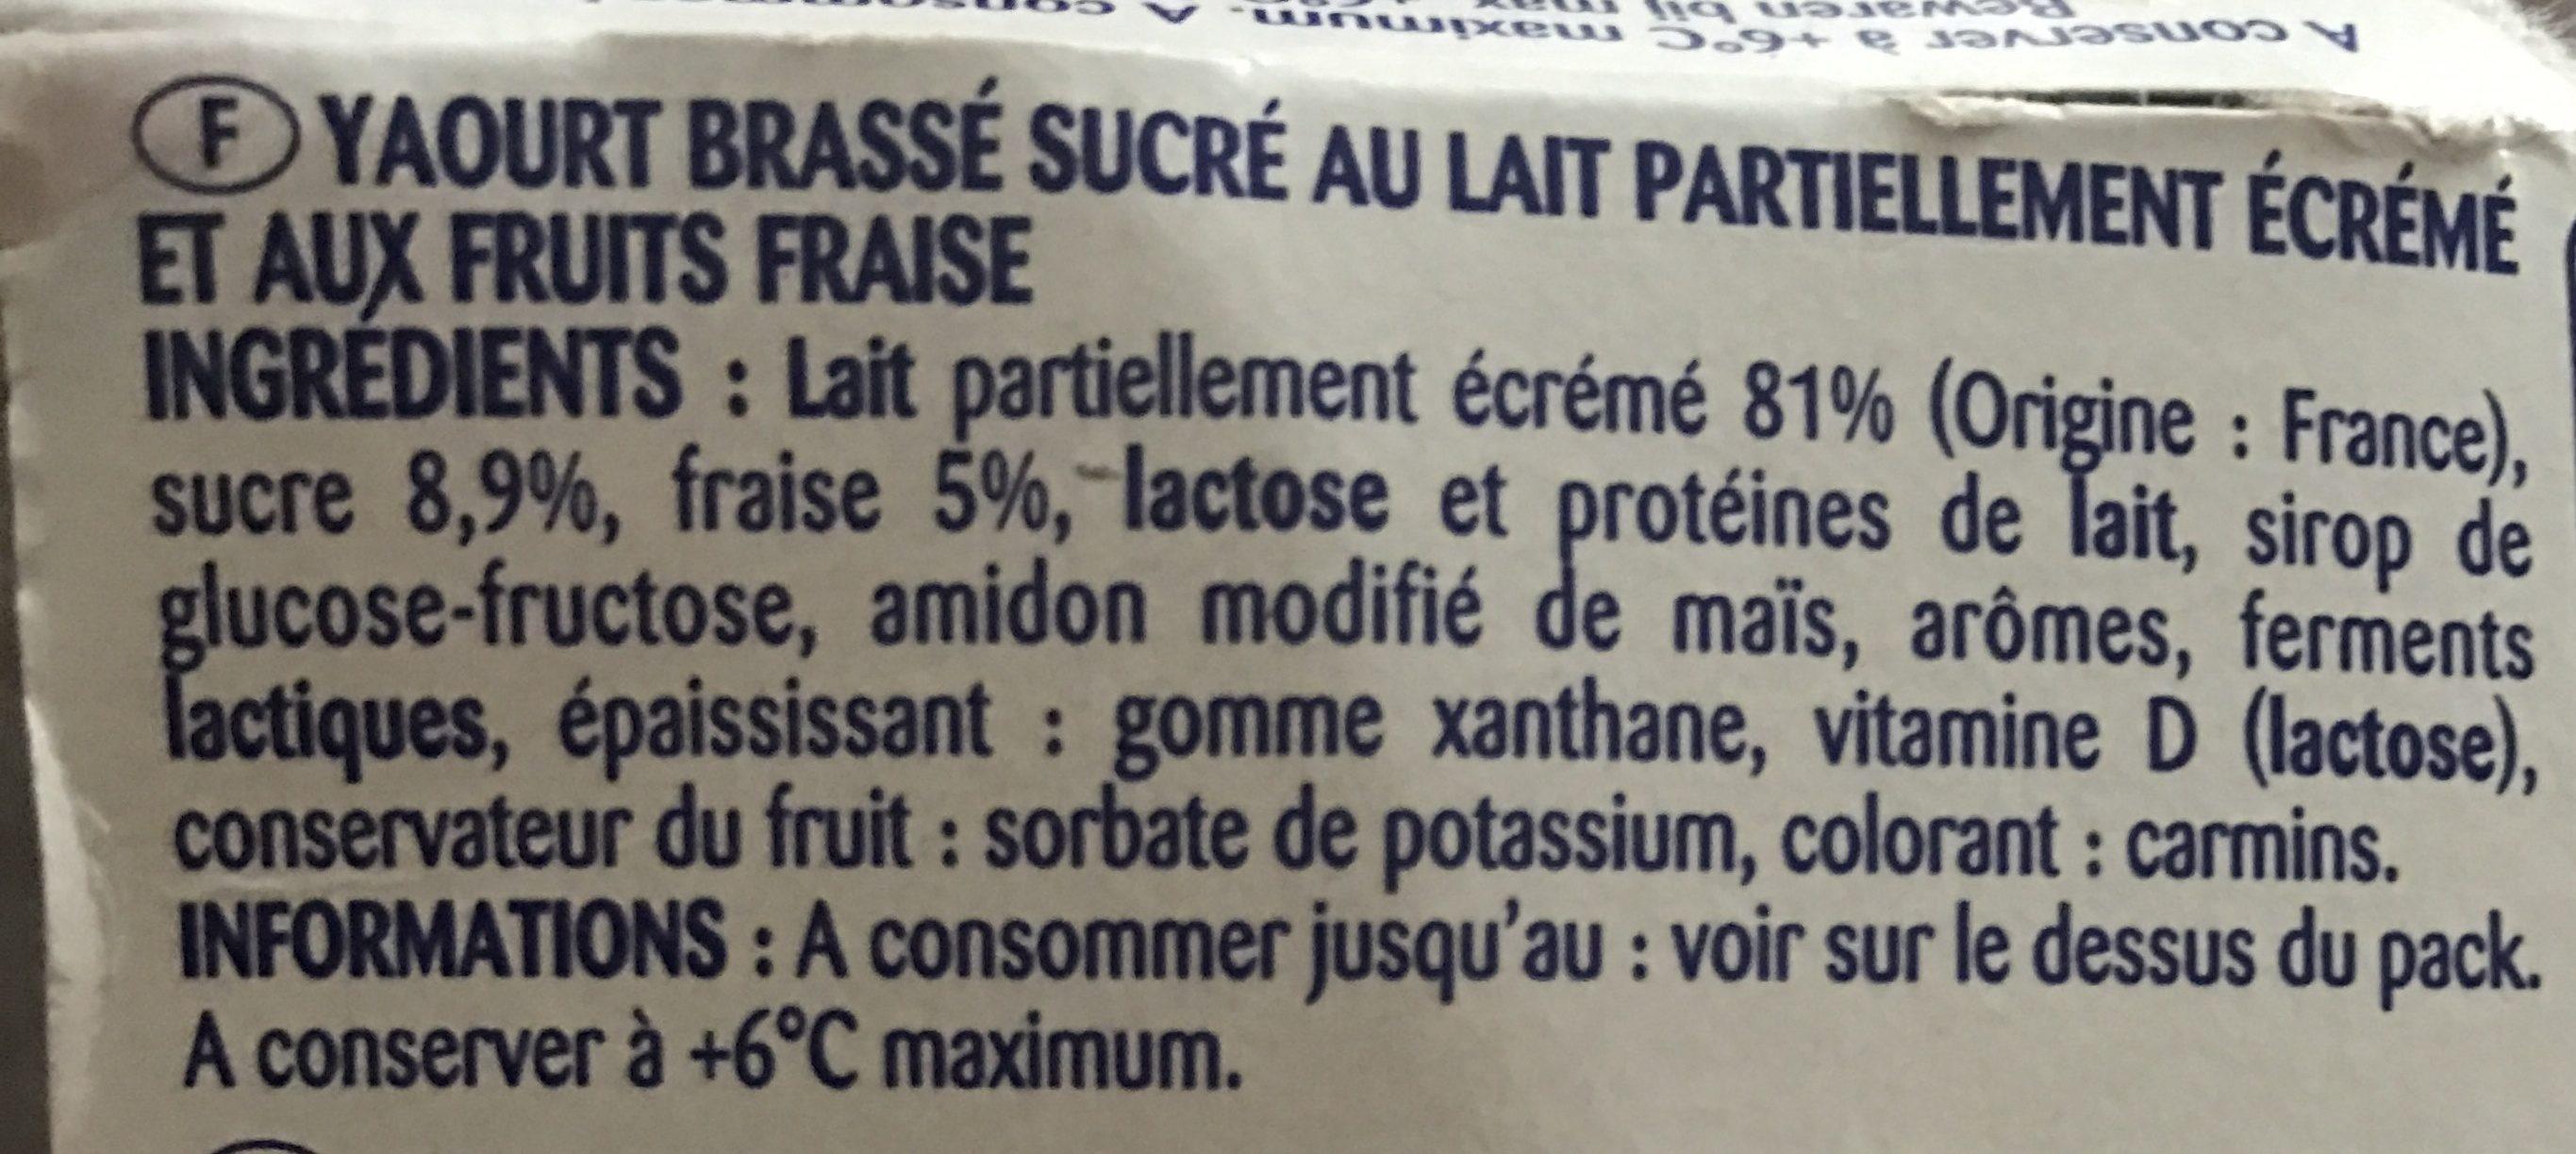 Onctueux Yt Bras Fraise - Ingrediënten - fr